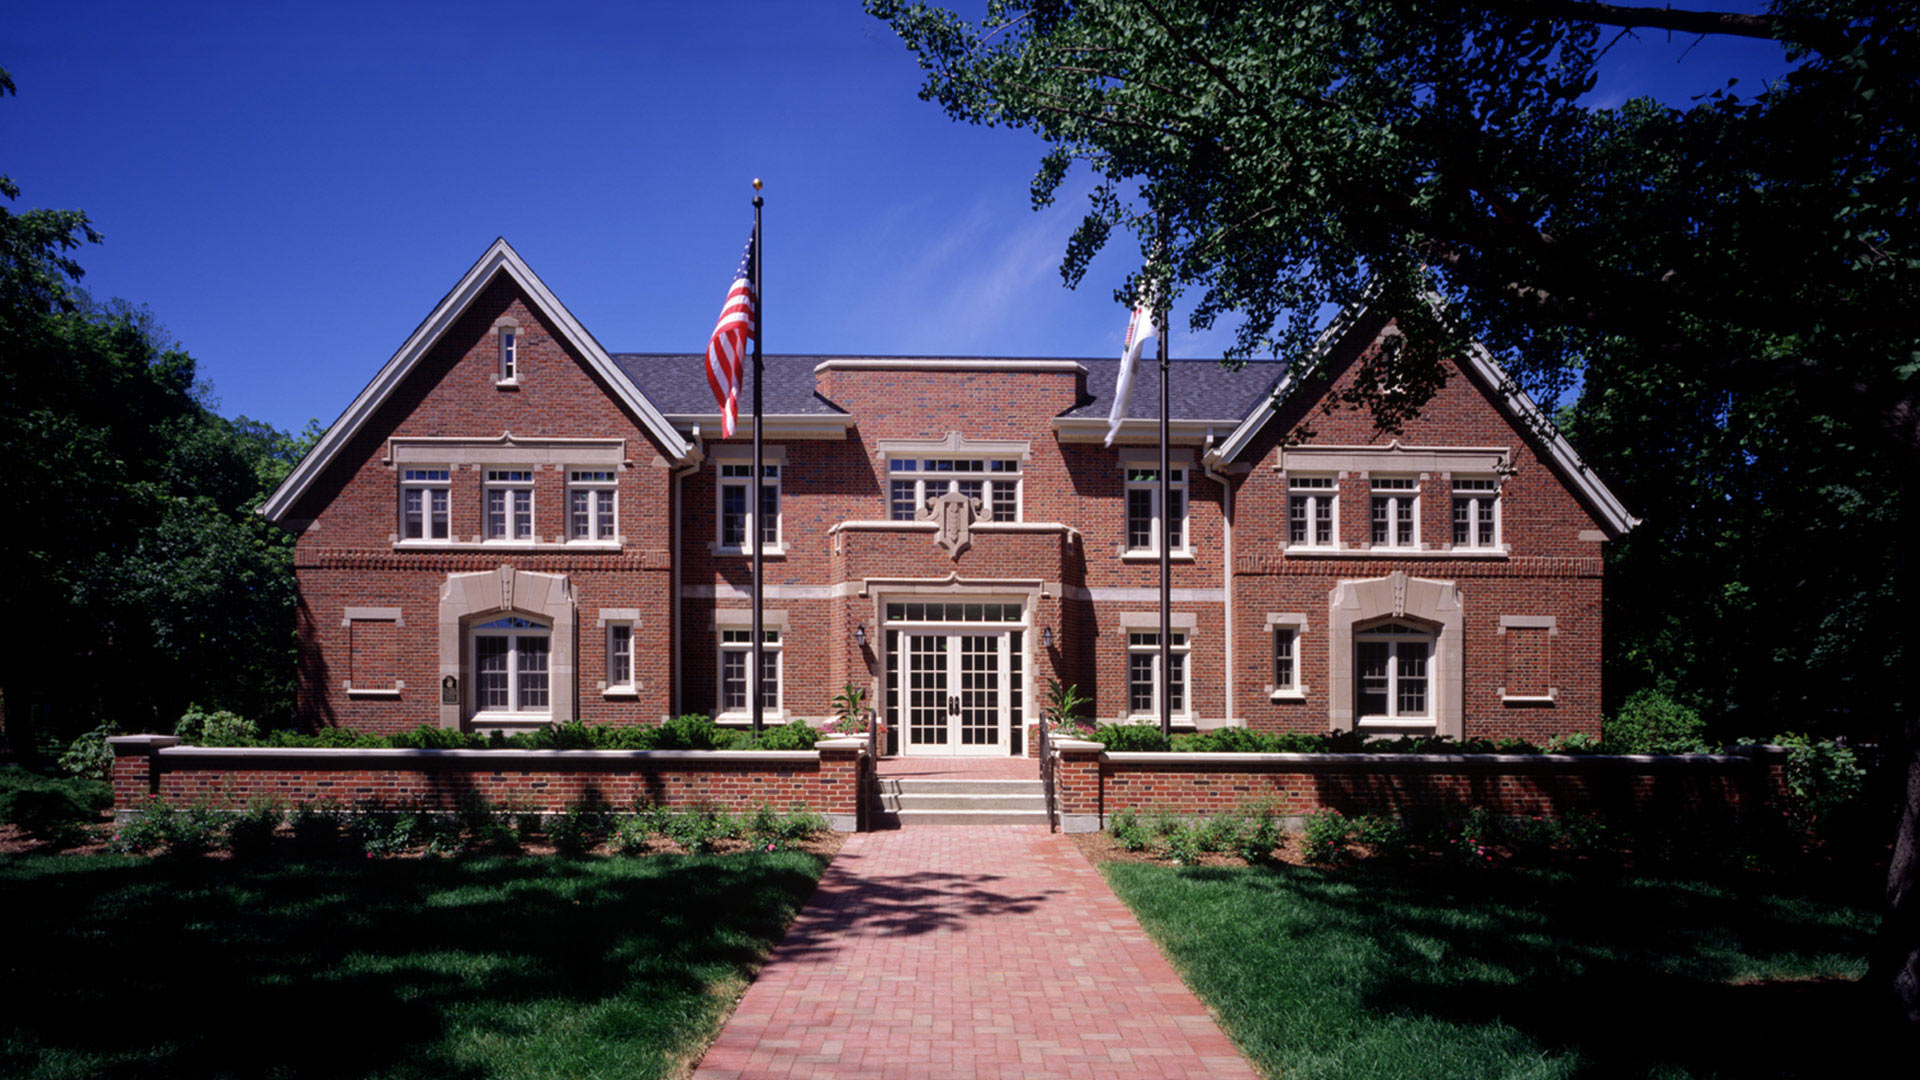 Glenview Park District Administration Building